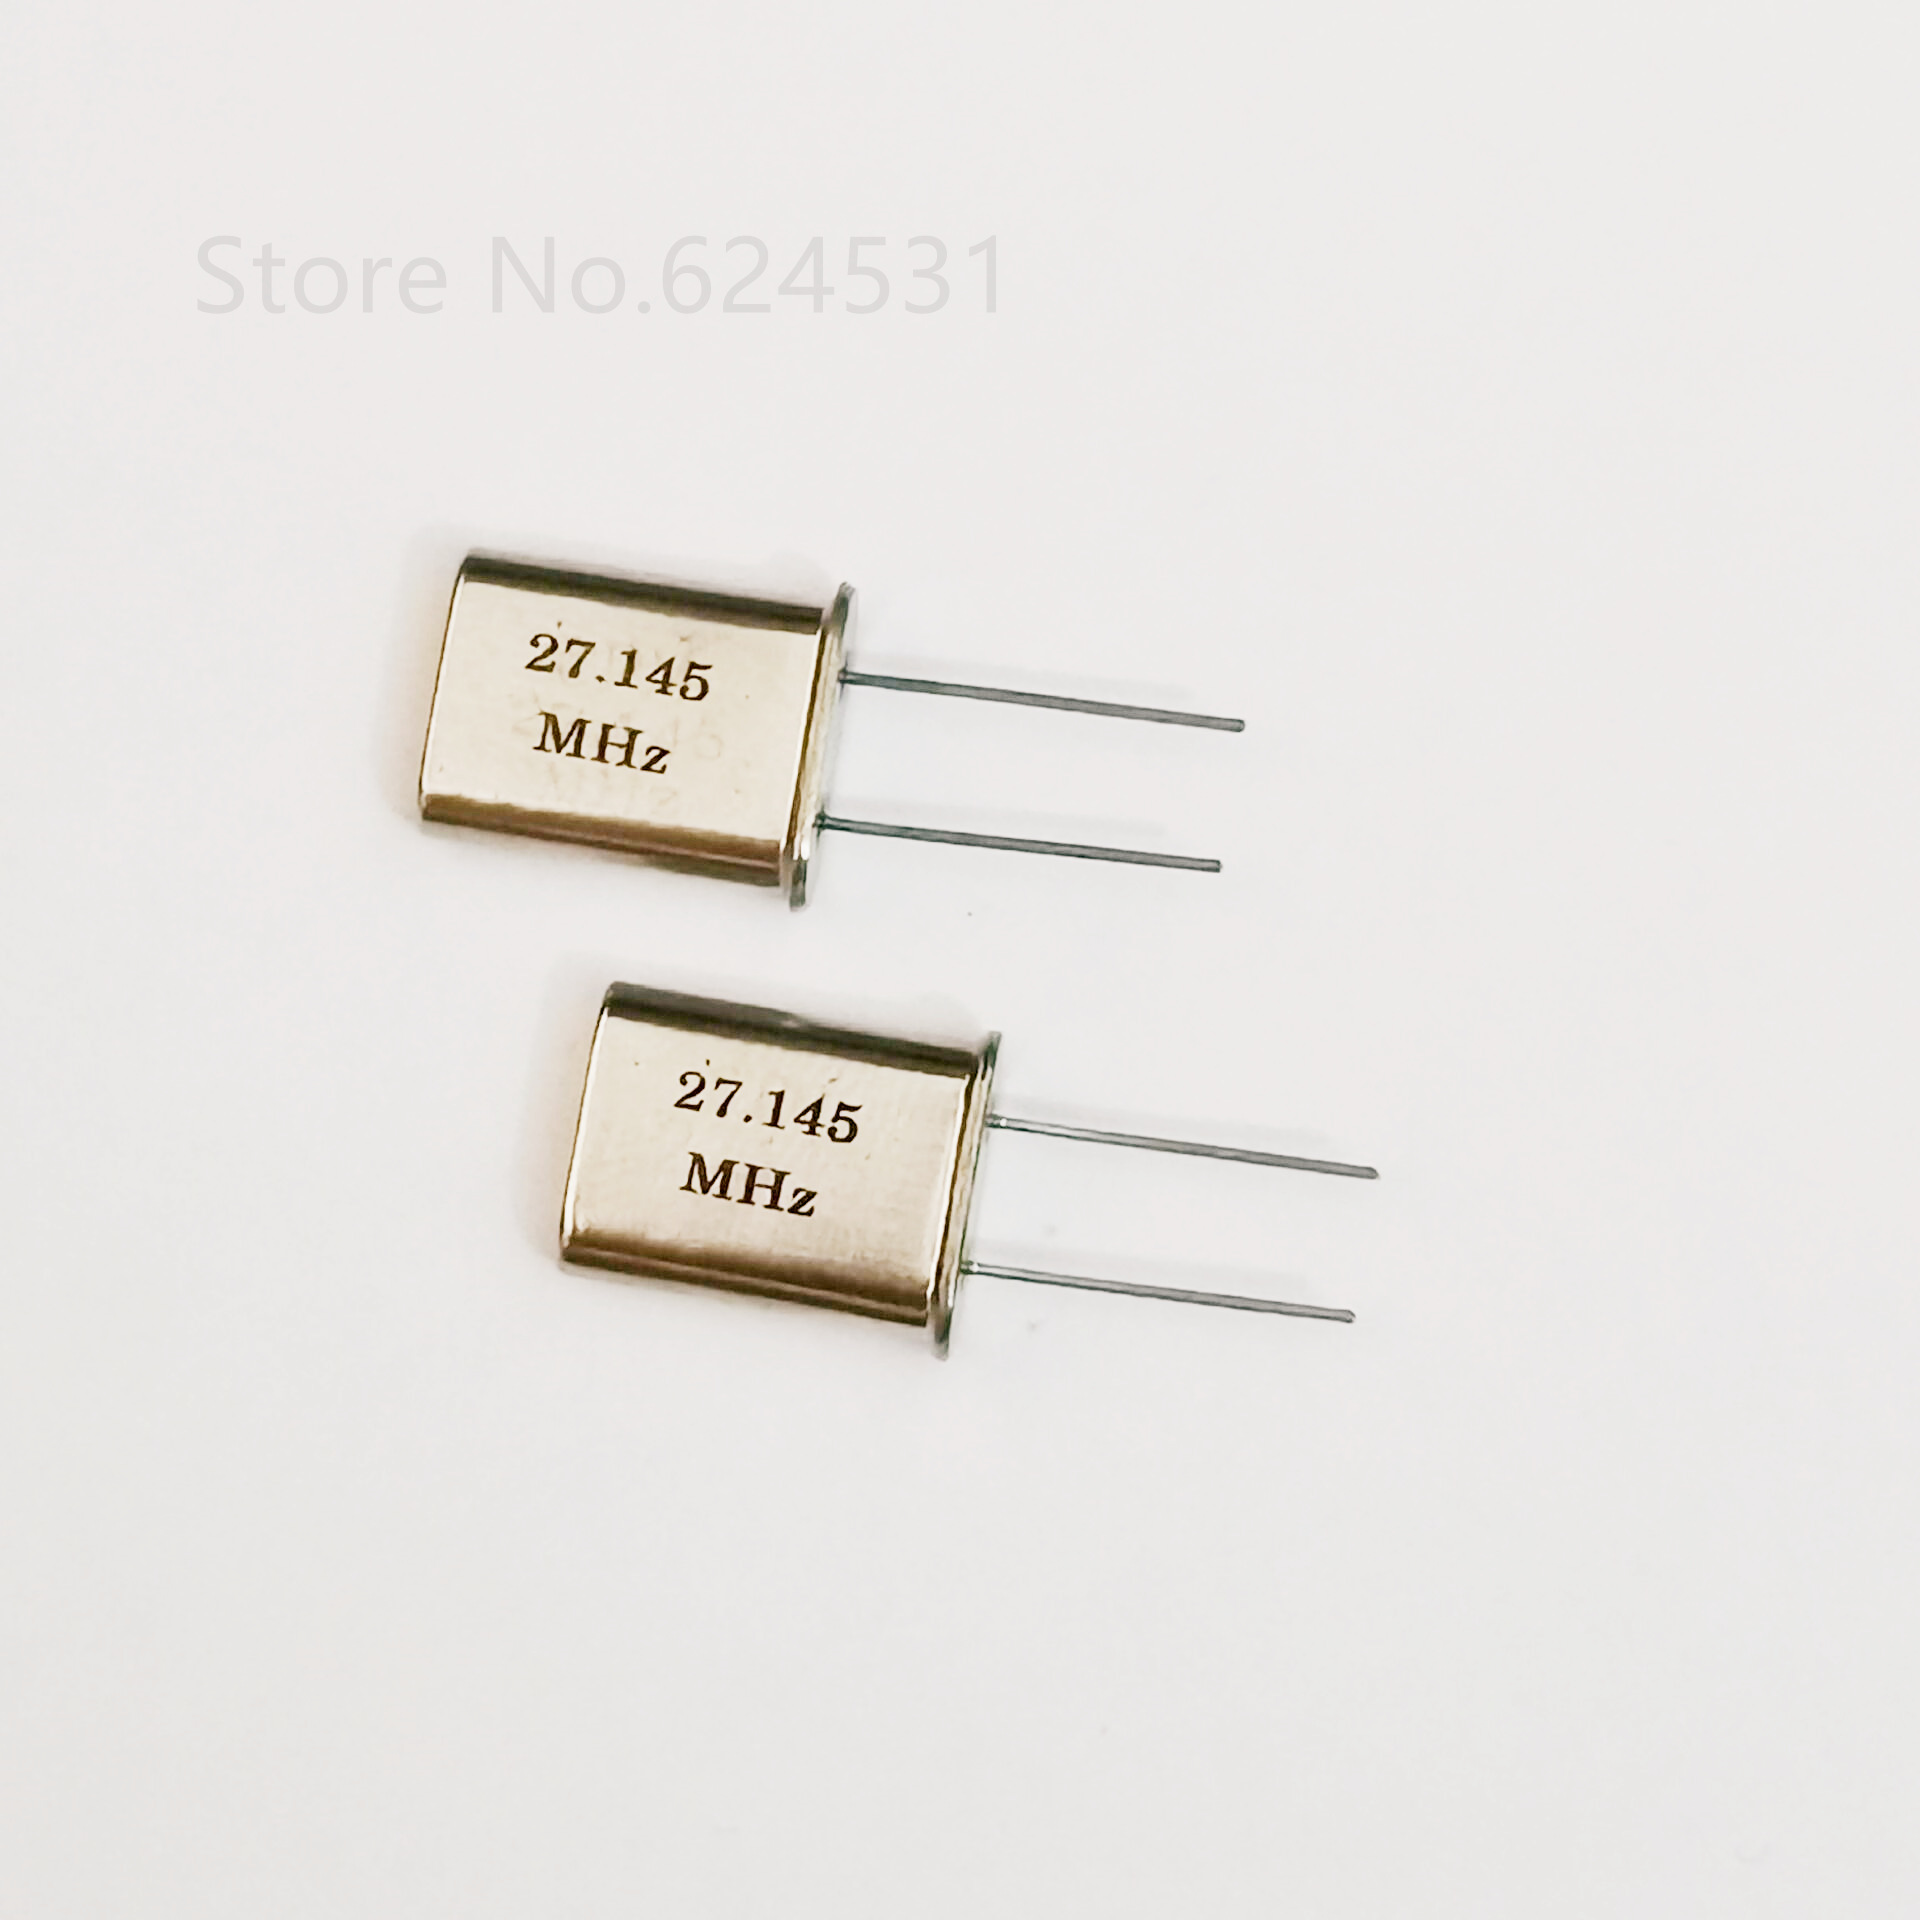 10pcs HC-49U In-line Quartz Crystal Oscillator 27.145MHZ 27.145M Passive Crystal Resonator